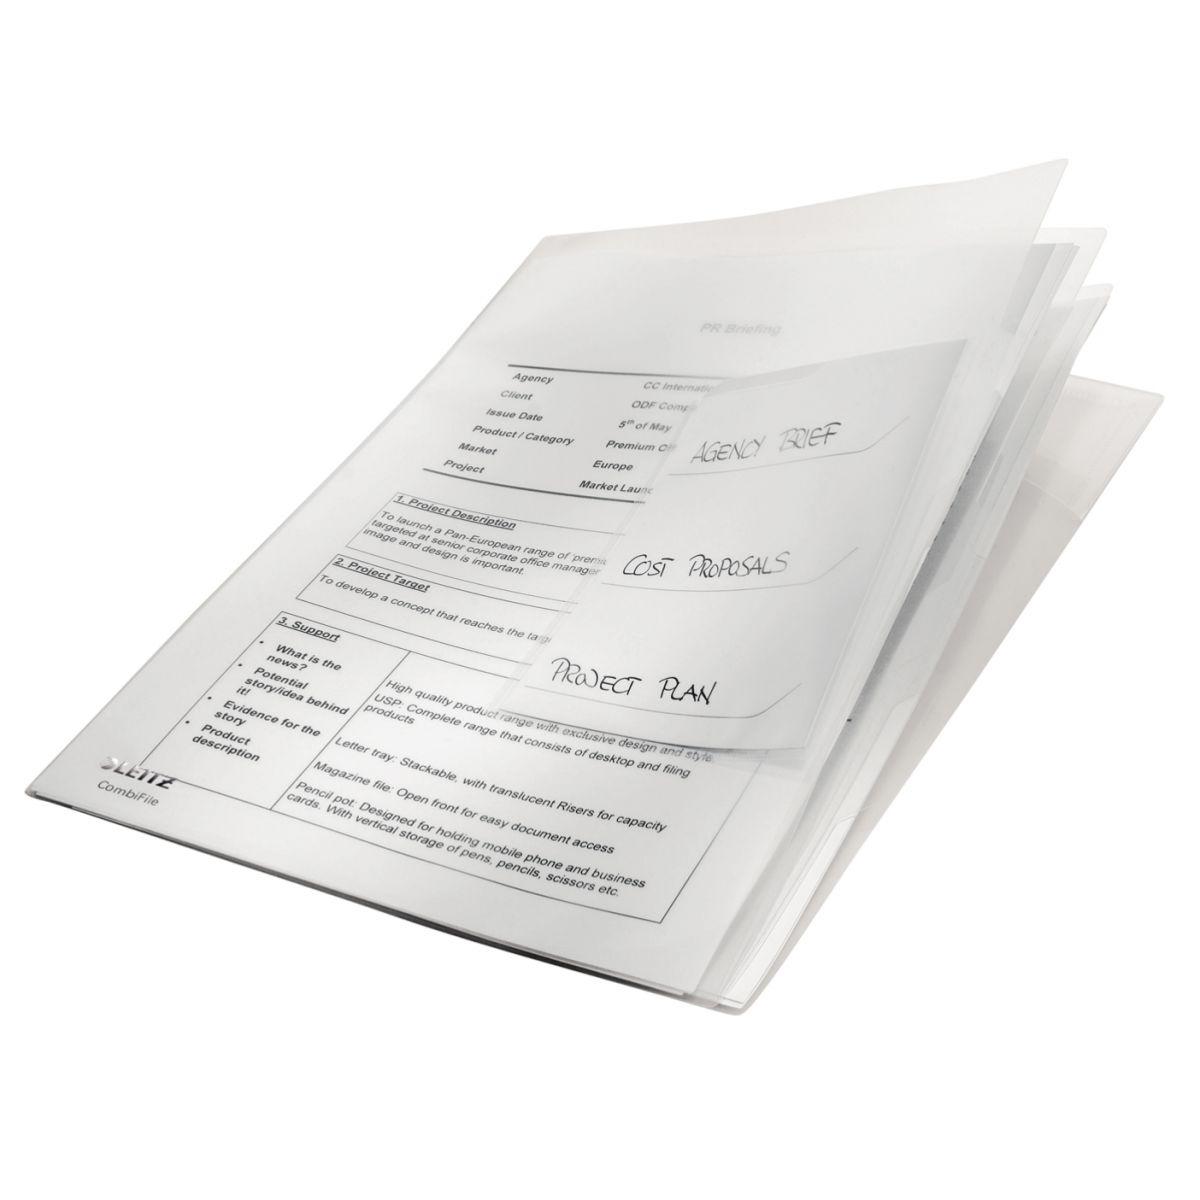 Pasta L Organizadora Esselte Leitz Combifile Branco Cristal 3x20 fls com 3 unid. 63484